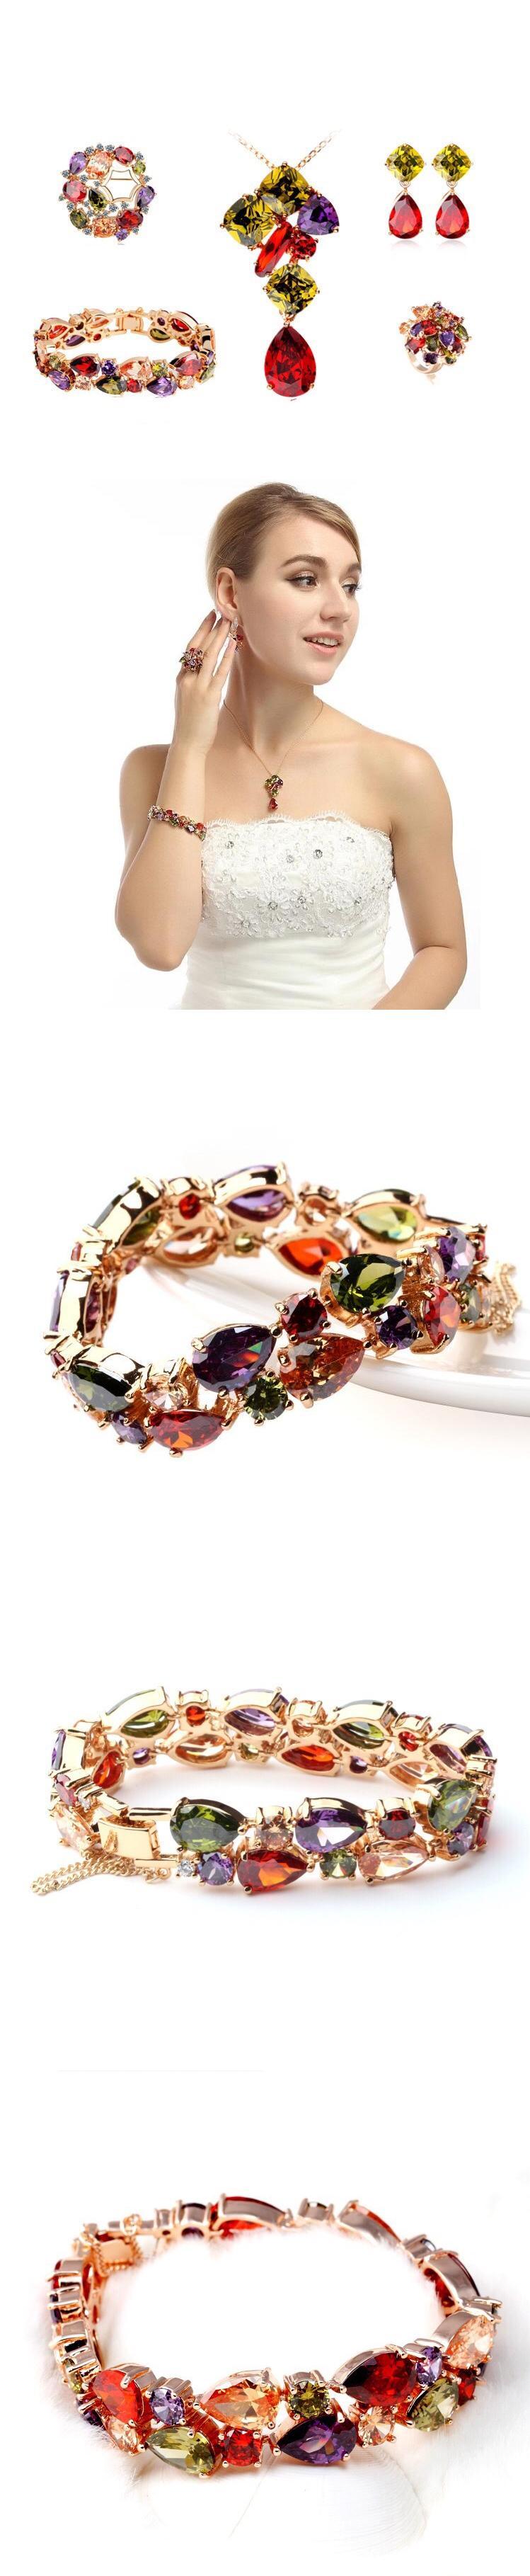 stainless+steel+jewelry bracelet gemstone gold plated bangle brass xuping jewelry